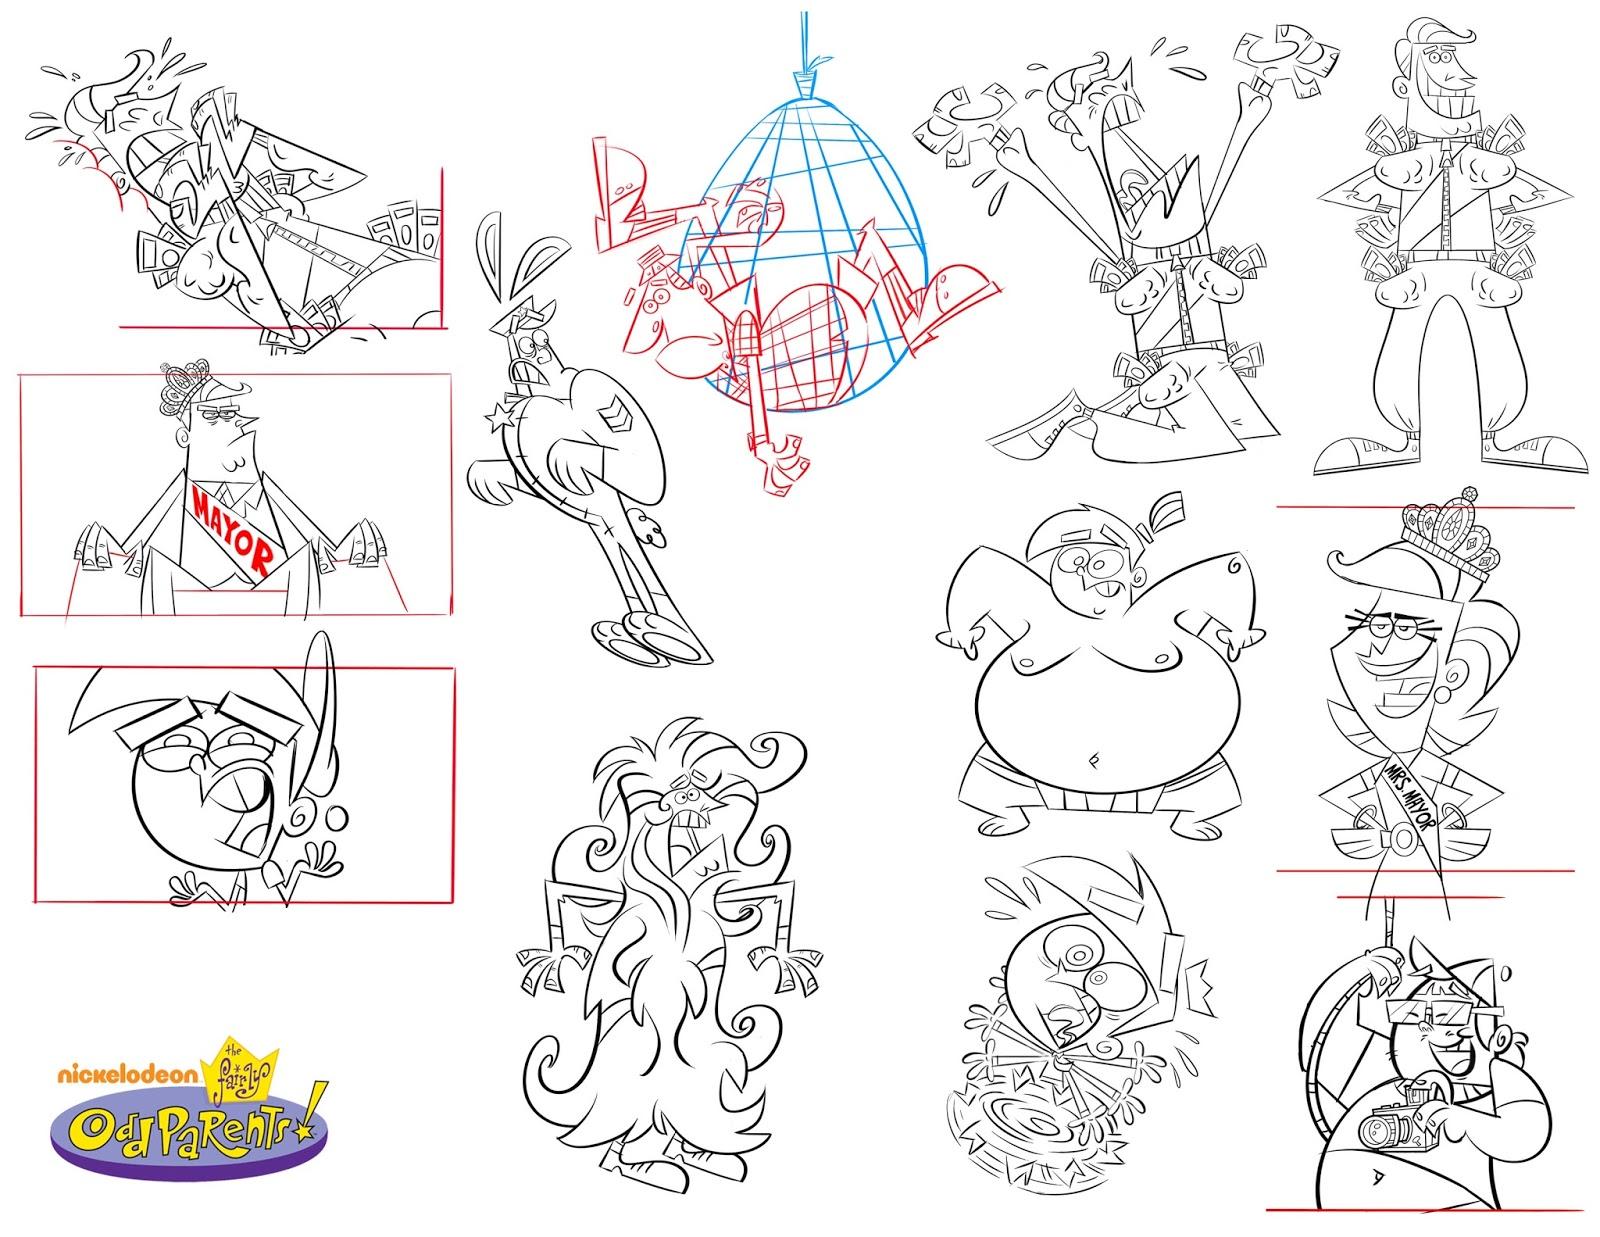 Character Design Nickelodeon :